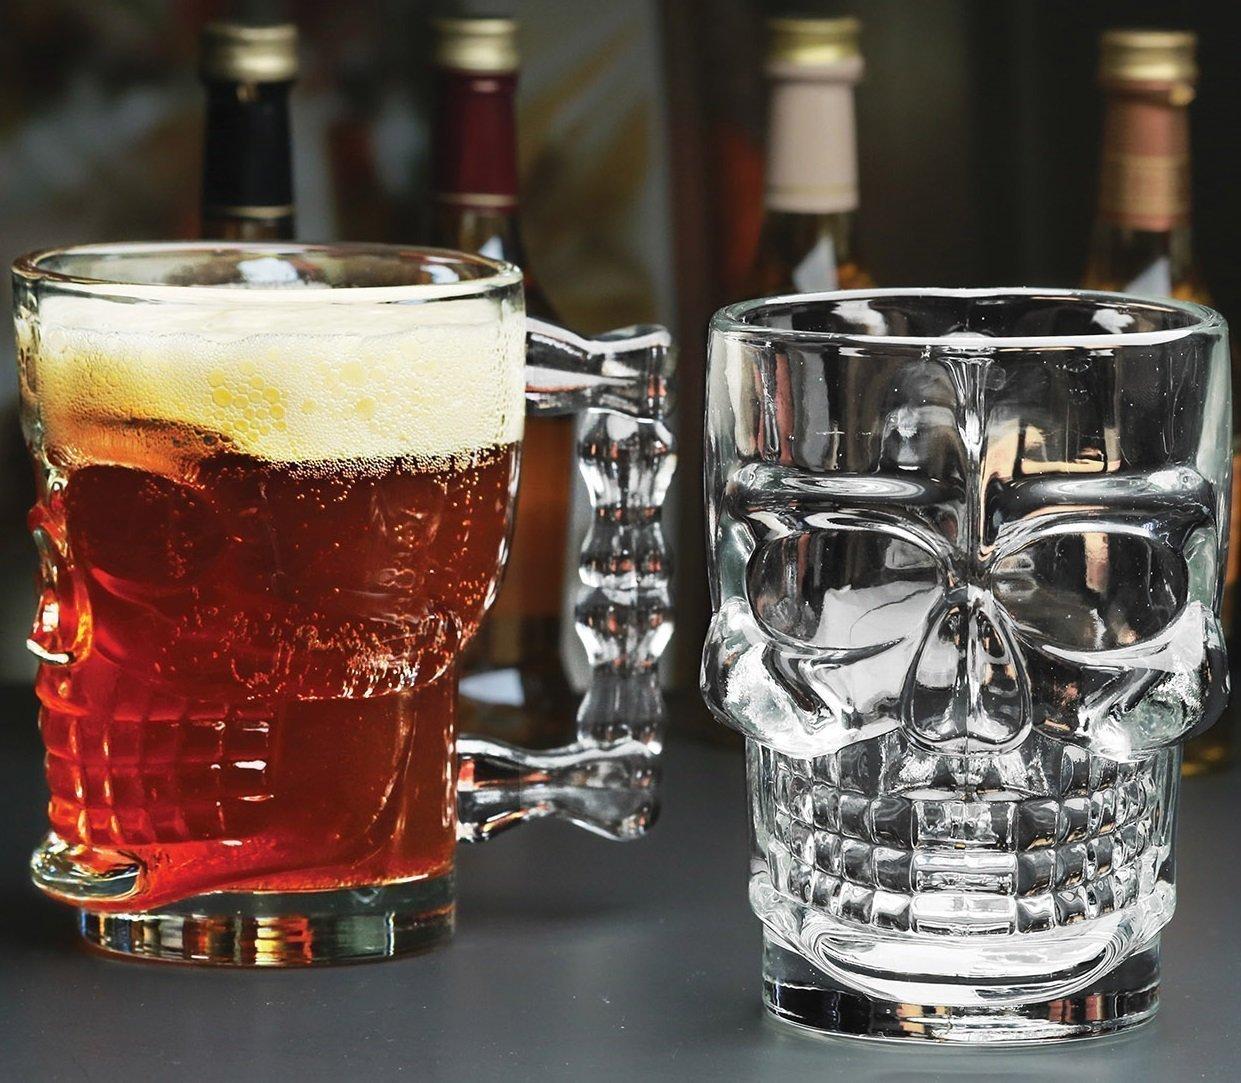 Classic Glass Beer Draft Mug glasses, ★ HALLOWEEN SKULL ★ , Set of 4, Glassware Solid Handled Clear Drinking Mugs, HC 3521